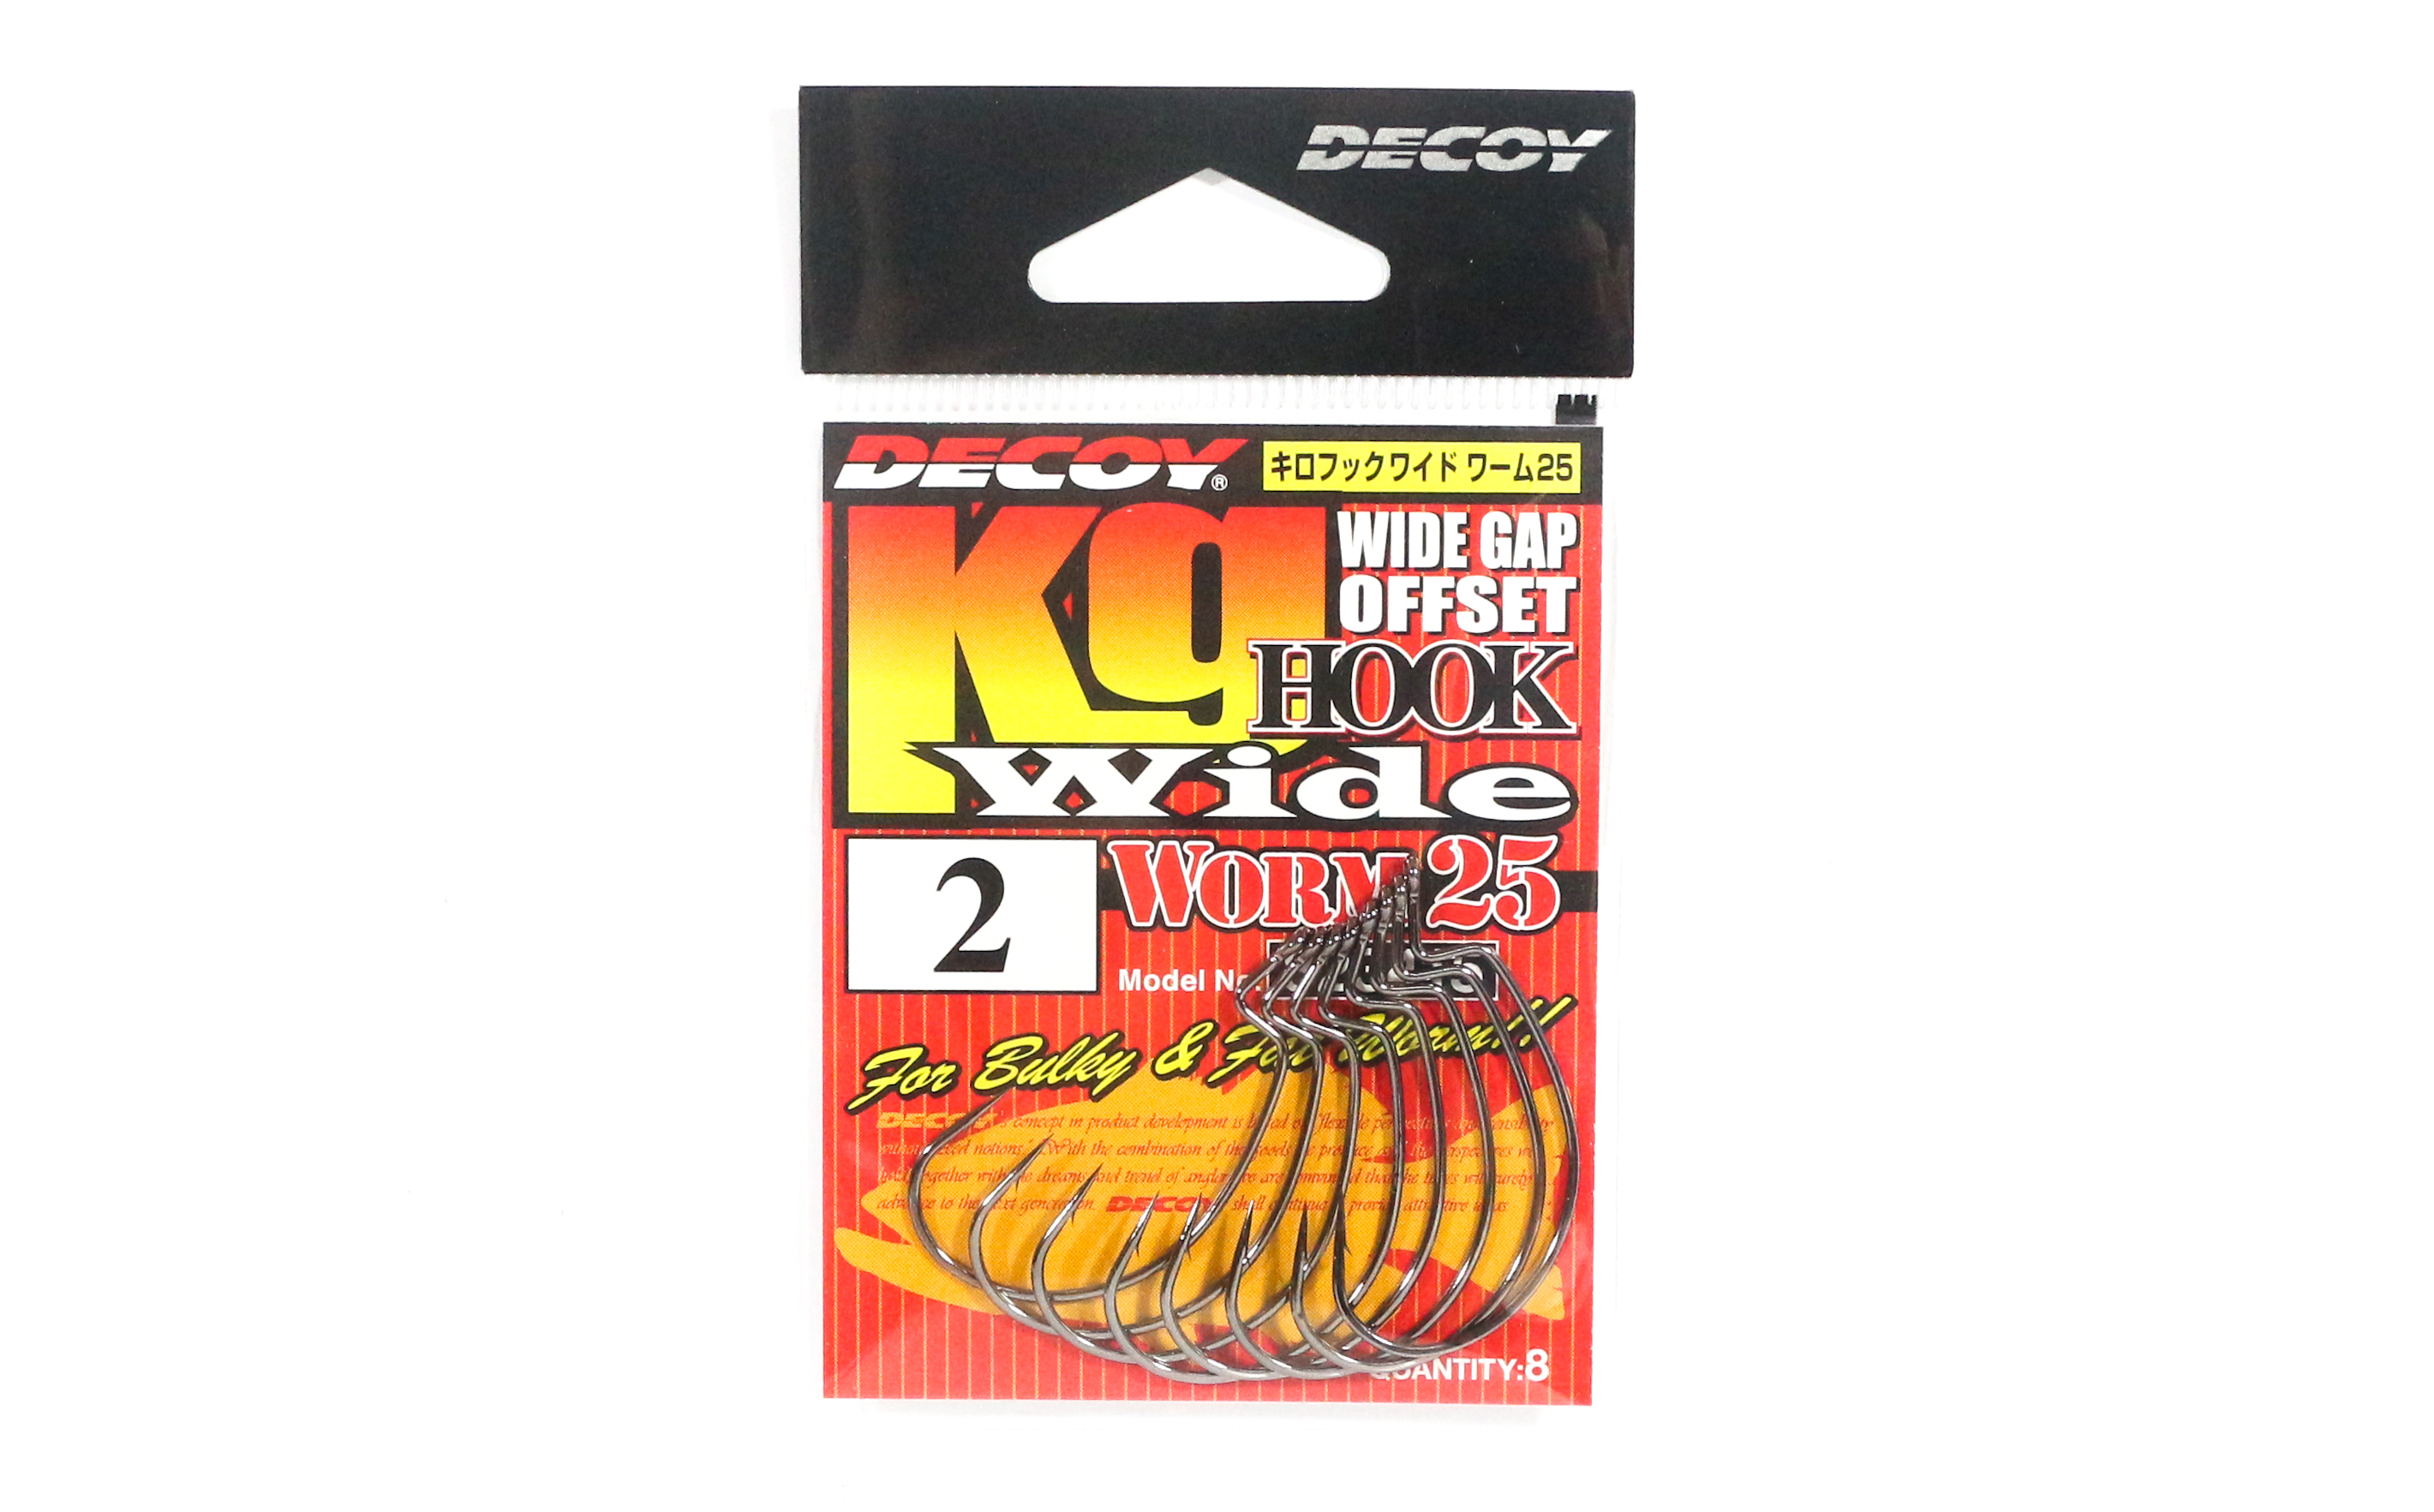 Decoy Worm 25KG Wide Gap Offset Worm Hooks Size 2 (3415)